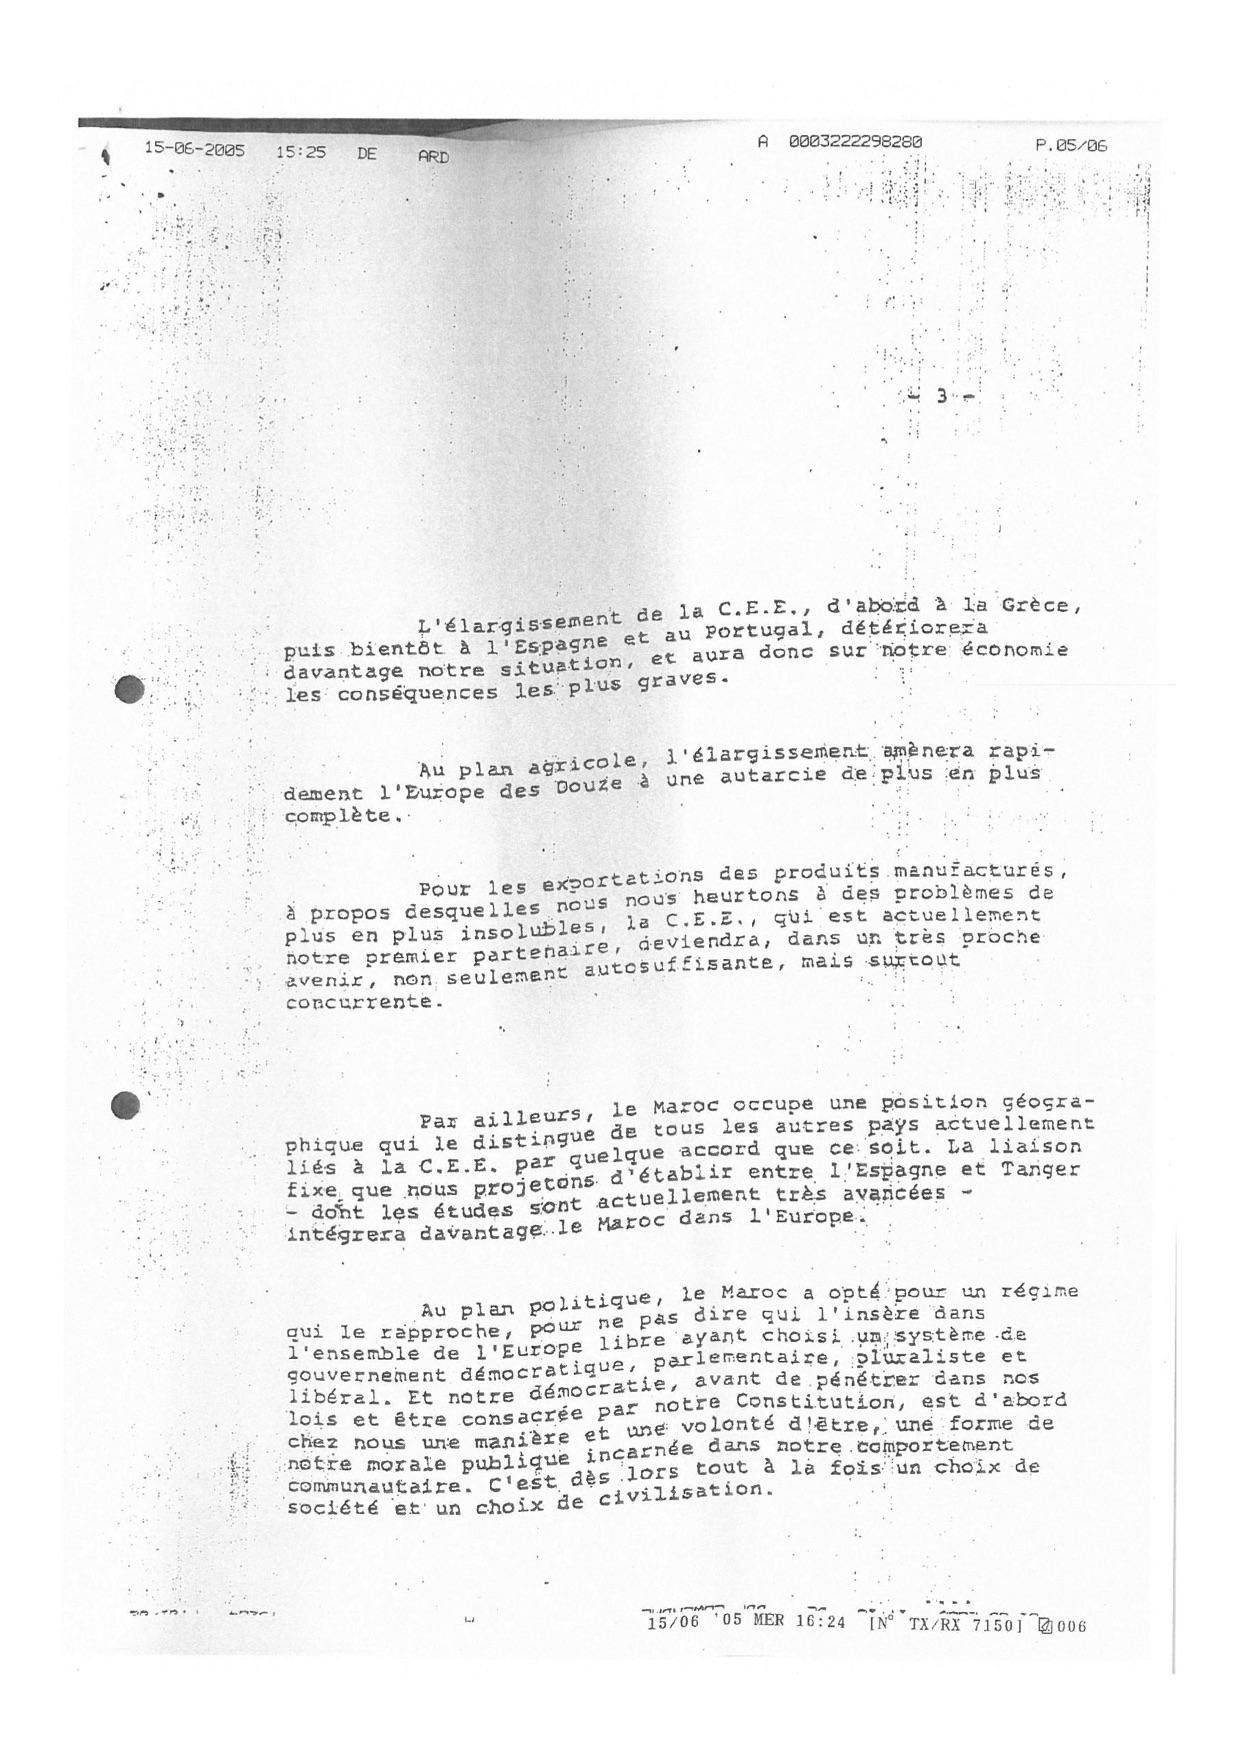 Lettre de Hassan II Mitterand 15.06.1984 three